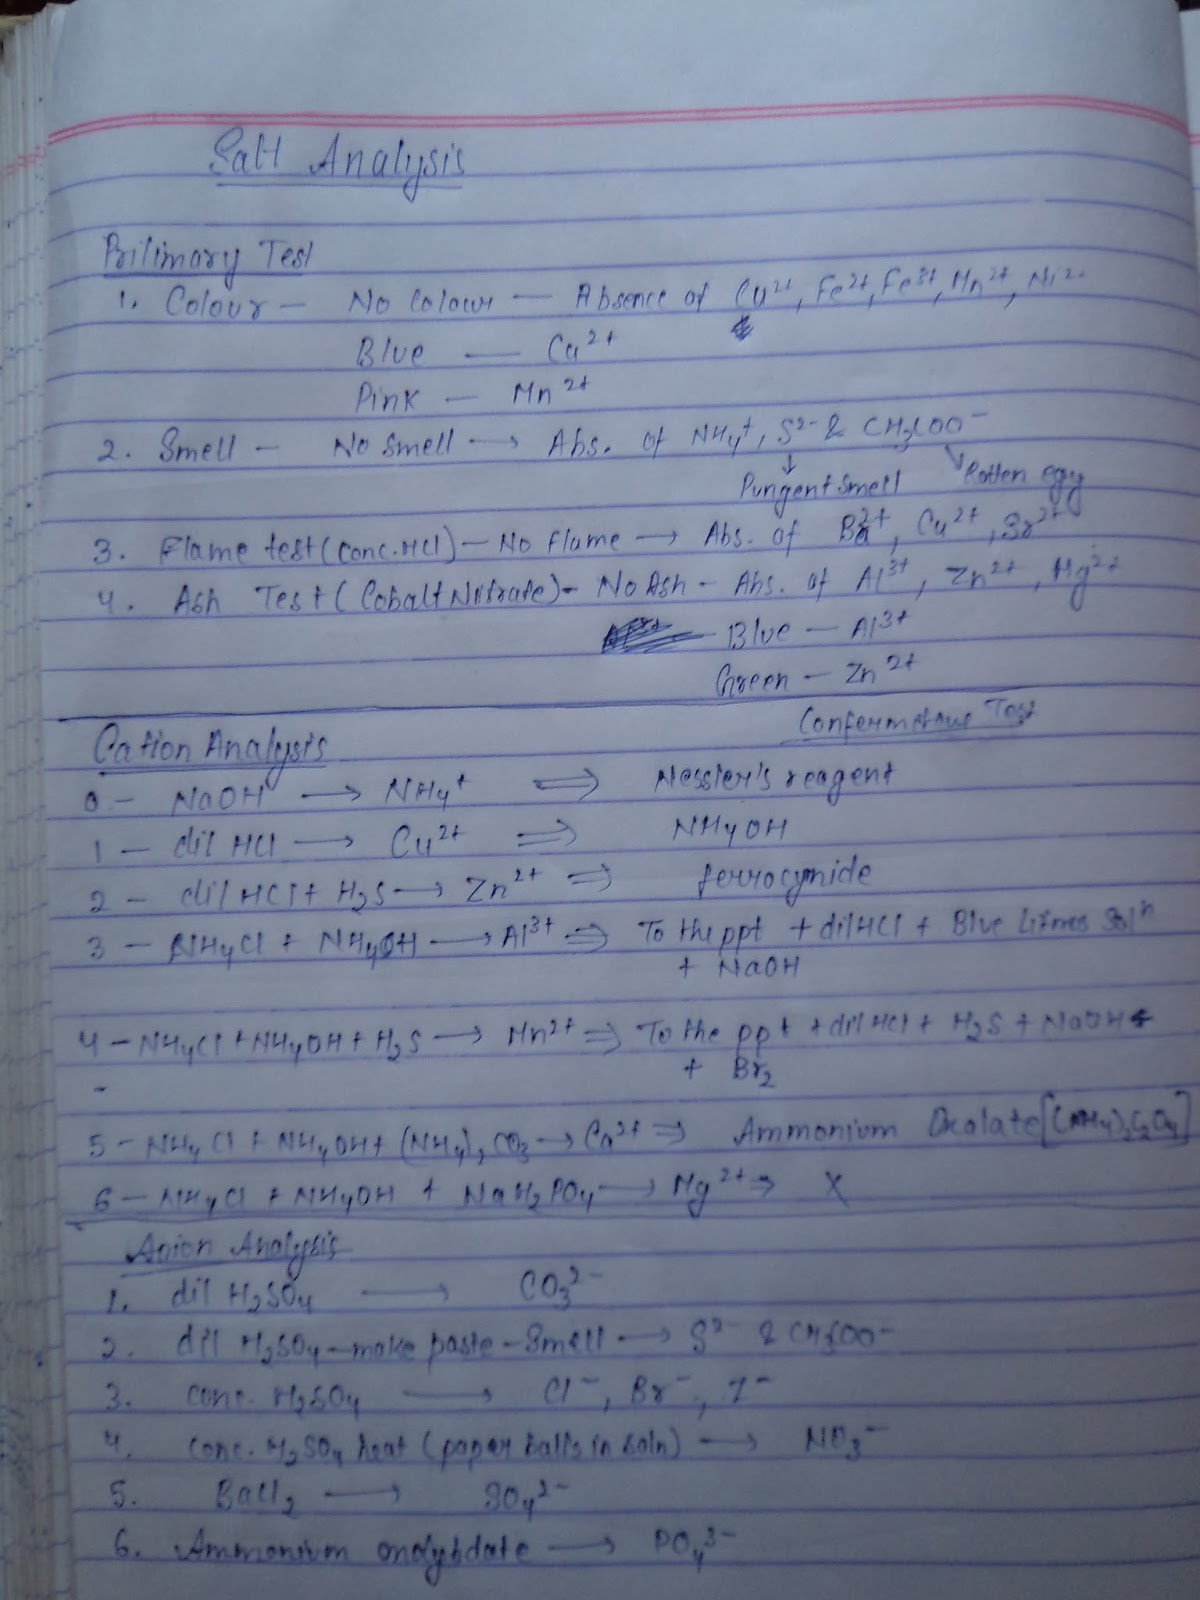 Deepanshu Niwati: CHEMISTRY PRACTICALS - SALT ANALYSIS